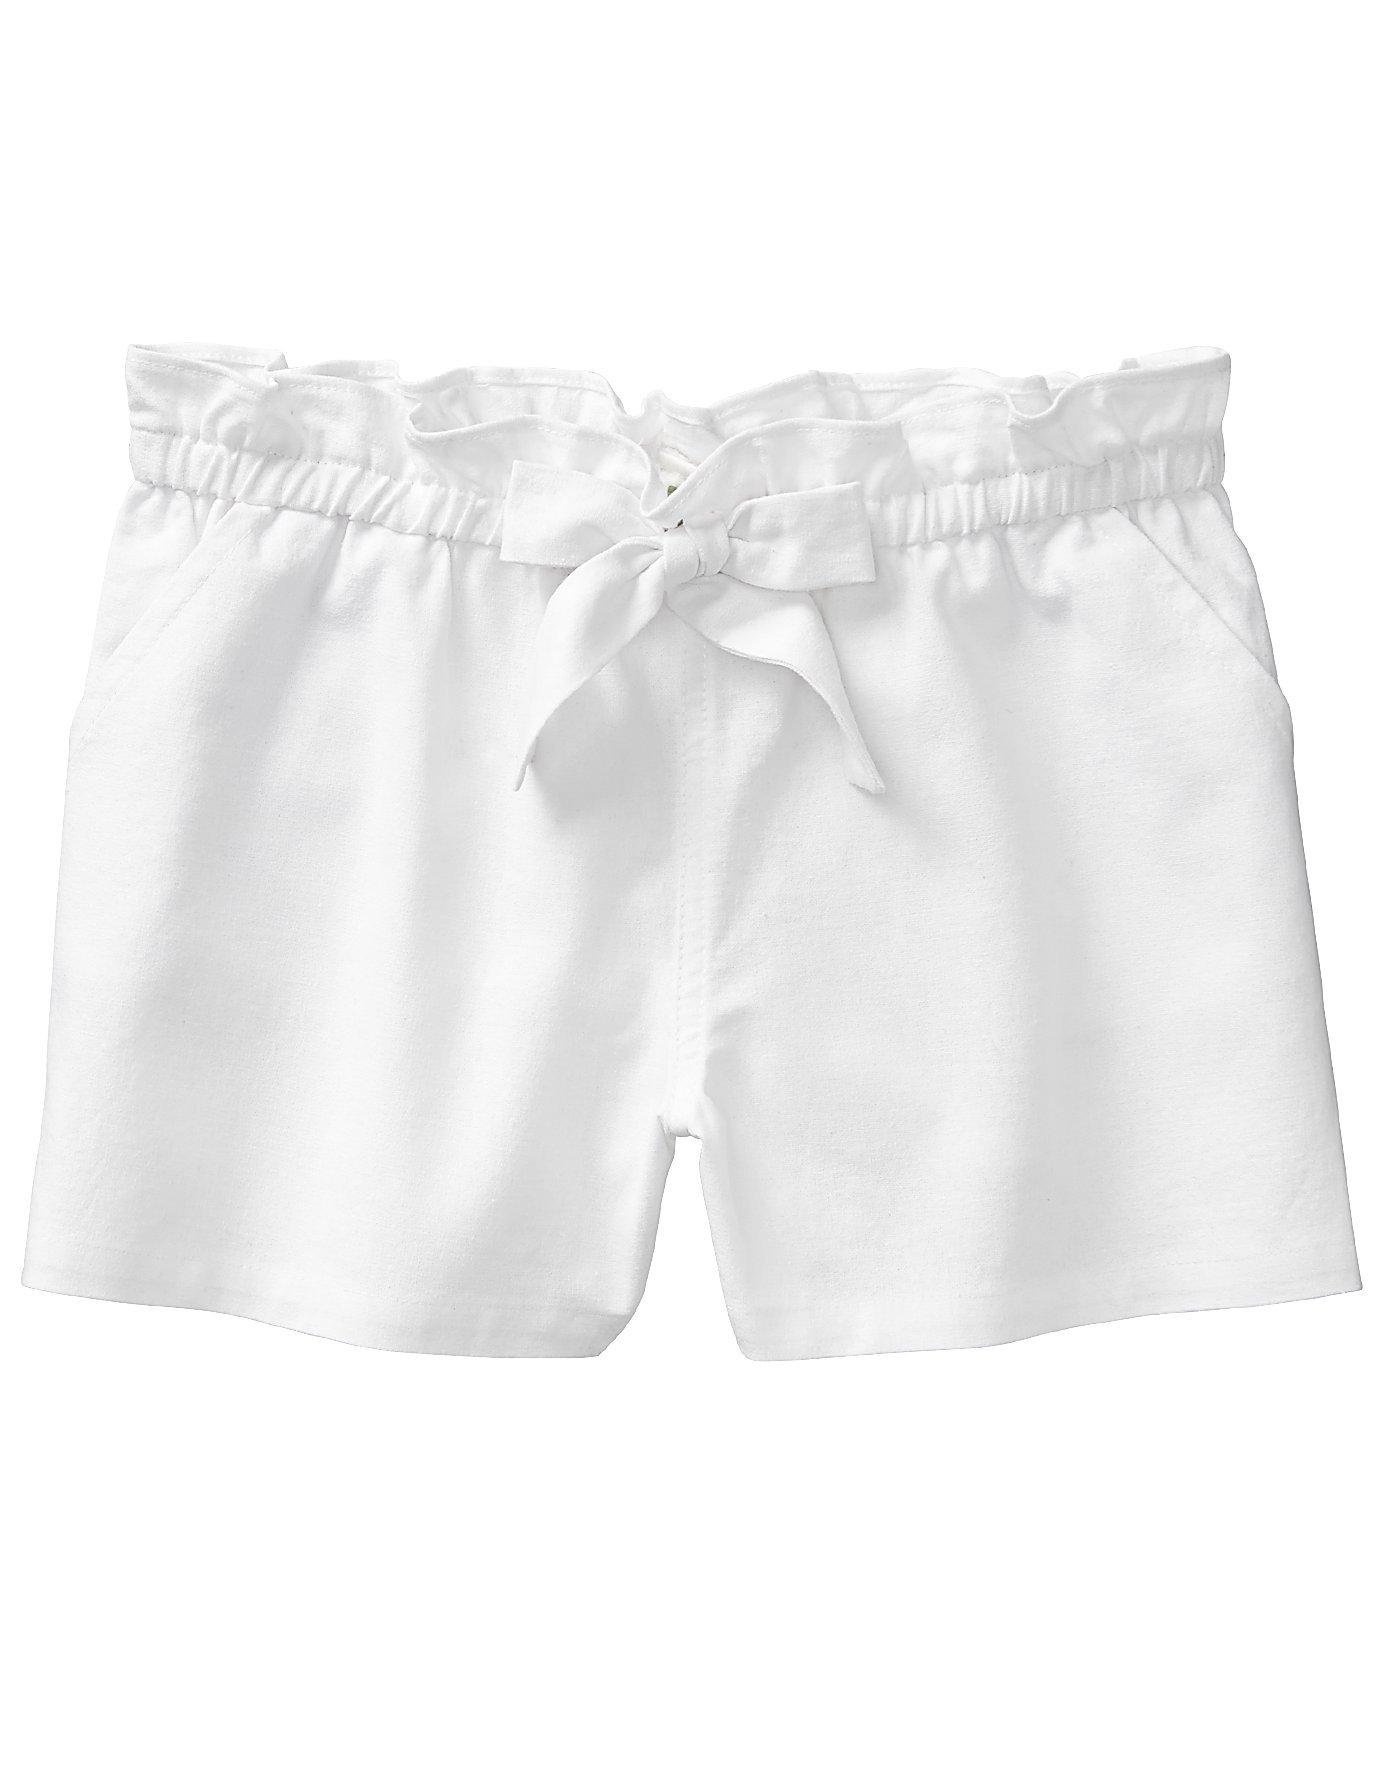 Crazy 8 Little Girls' Woven Bag Short, White Belted, XS